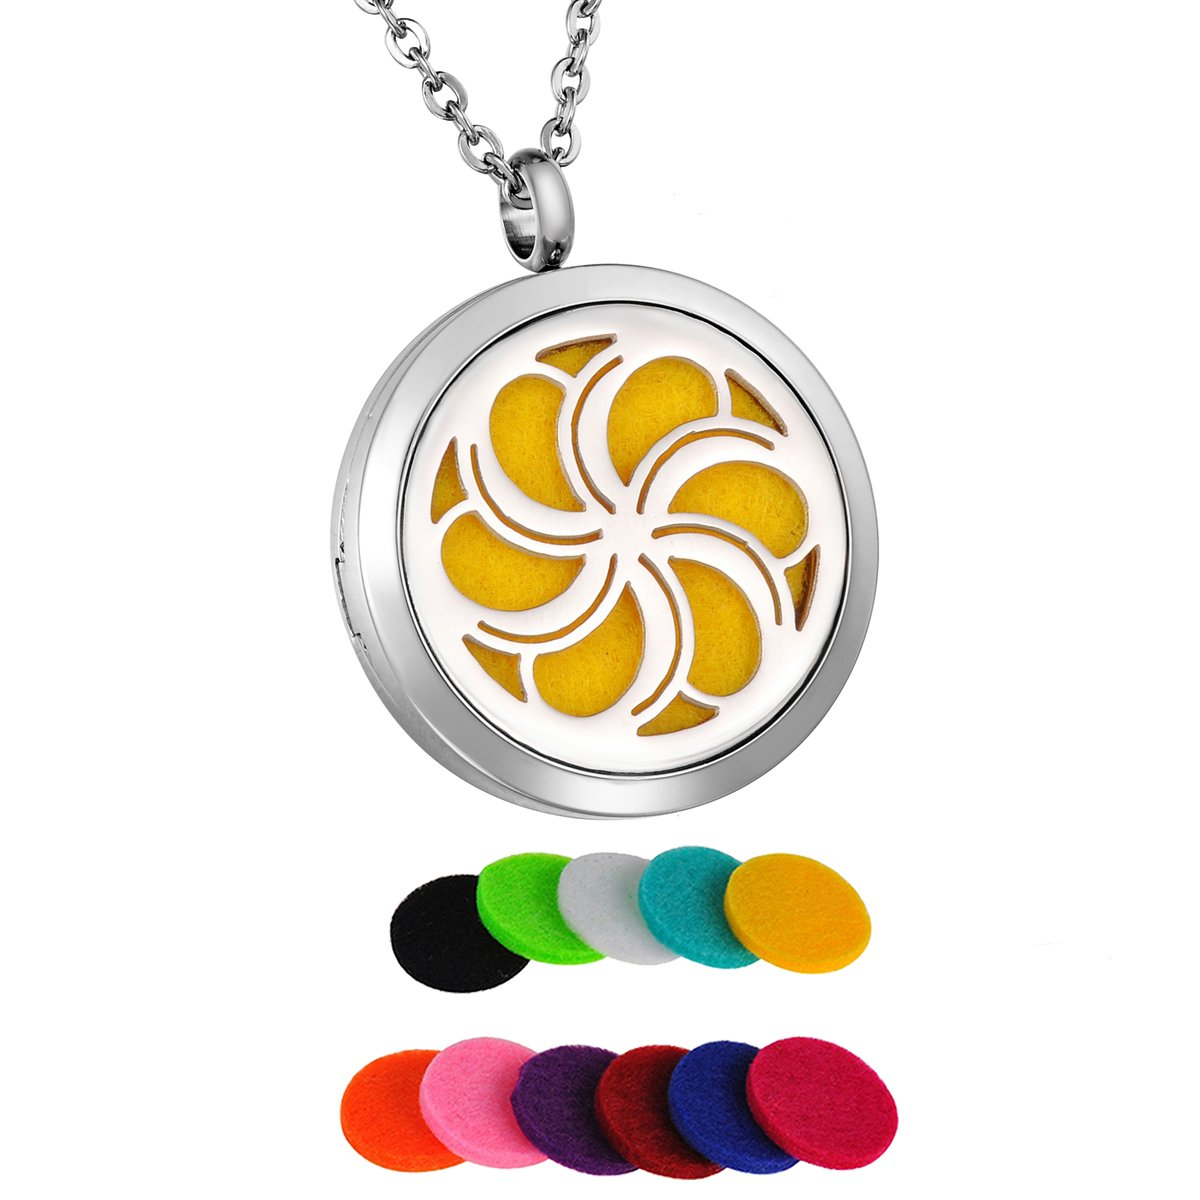 HooAMI Plumeria Flower Aromatherapy Essential Oil Diffuser Necklace Locket Pendant TY BETY104080